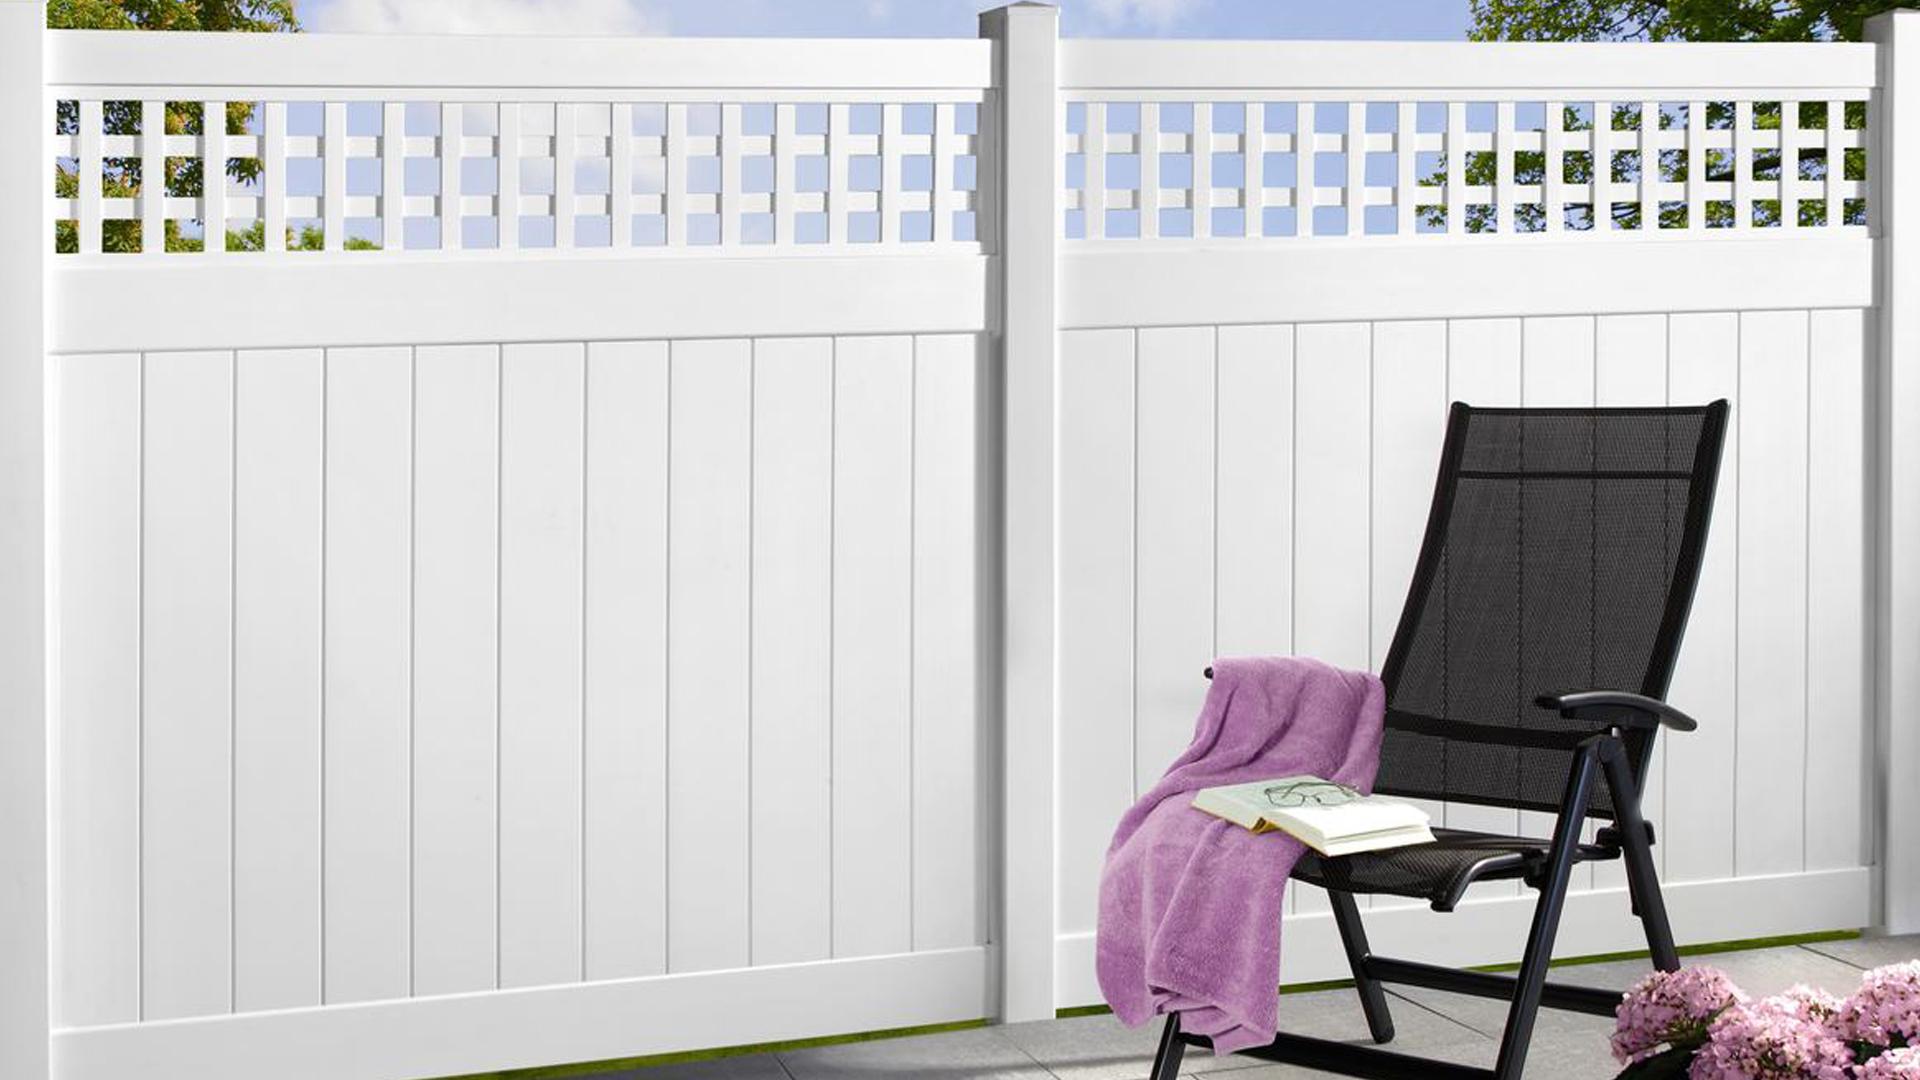 angebote sichtschutzzaun zaun lamellenzaun kunststoff bei. Black Bedroom Furniture Sets. Home Design Ideas